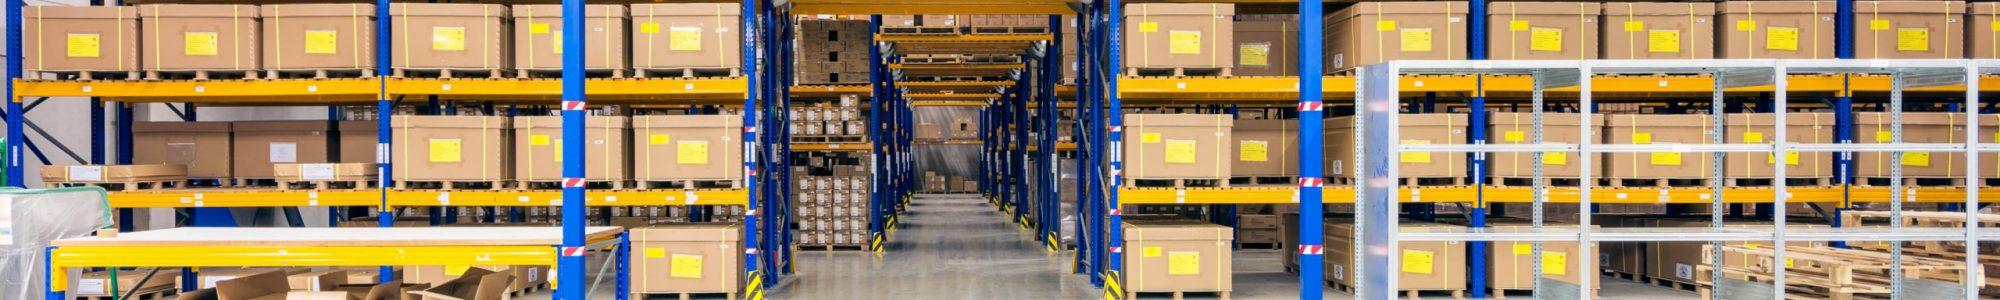 Warehouse & Racking